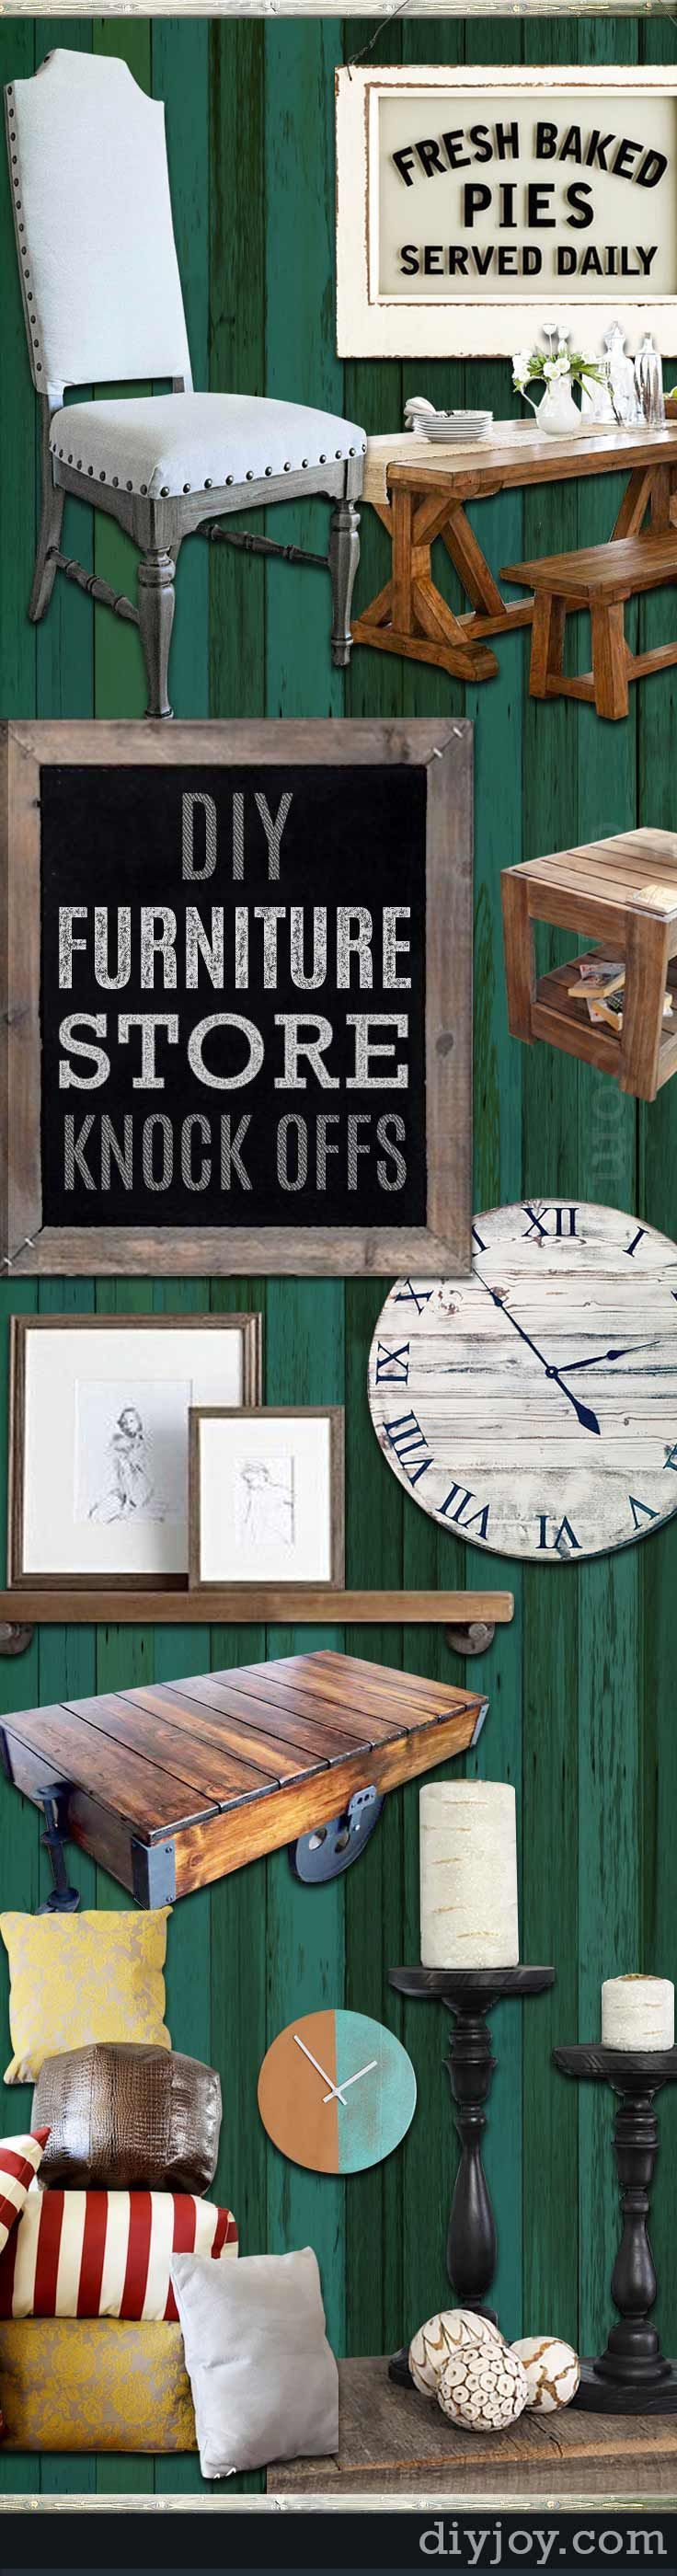 52 Incredible DIY Furniture Store Knock Offs   Furniture ...